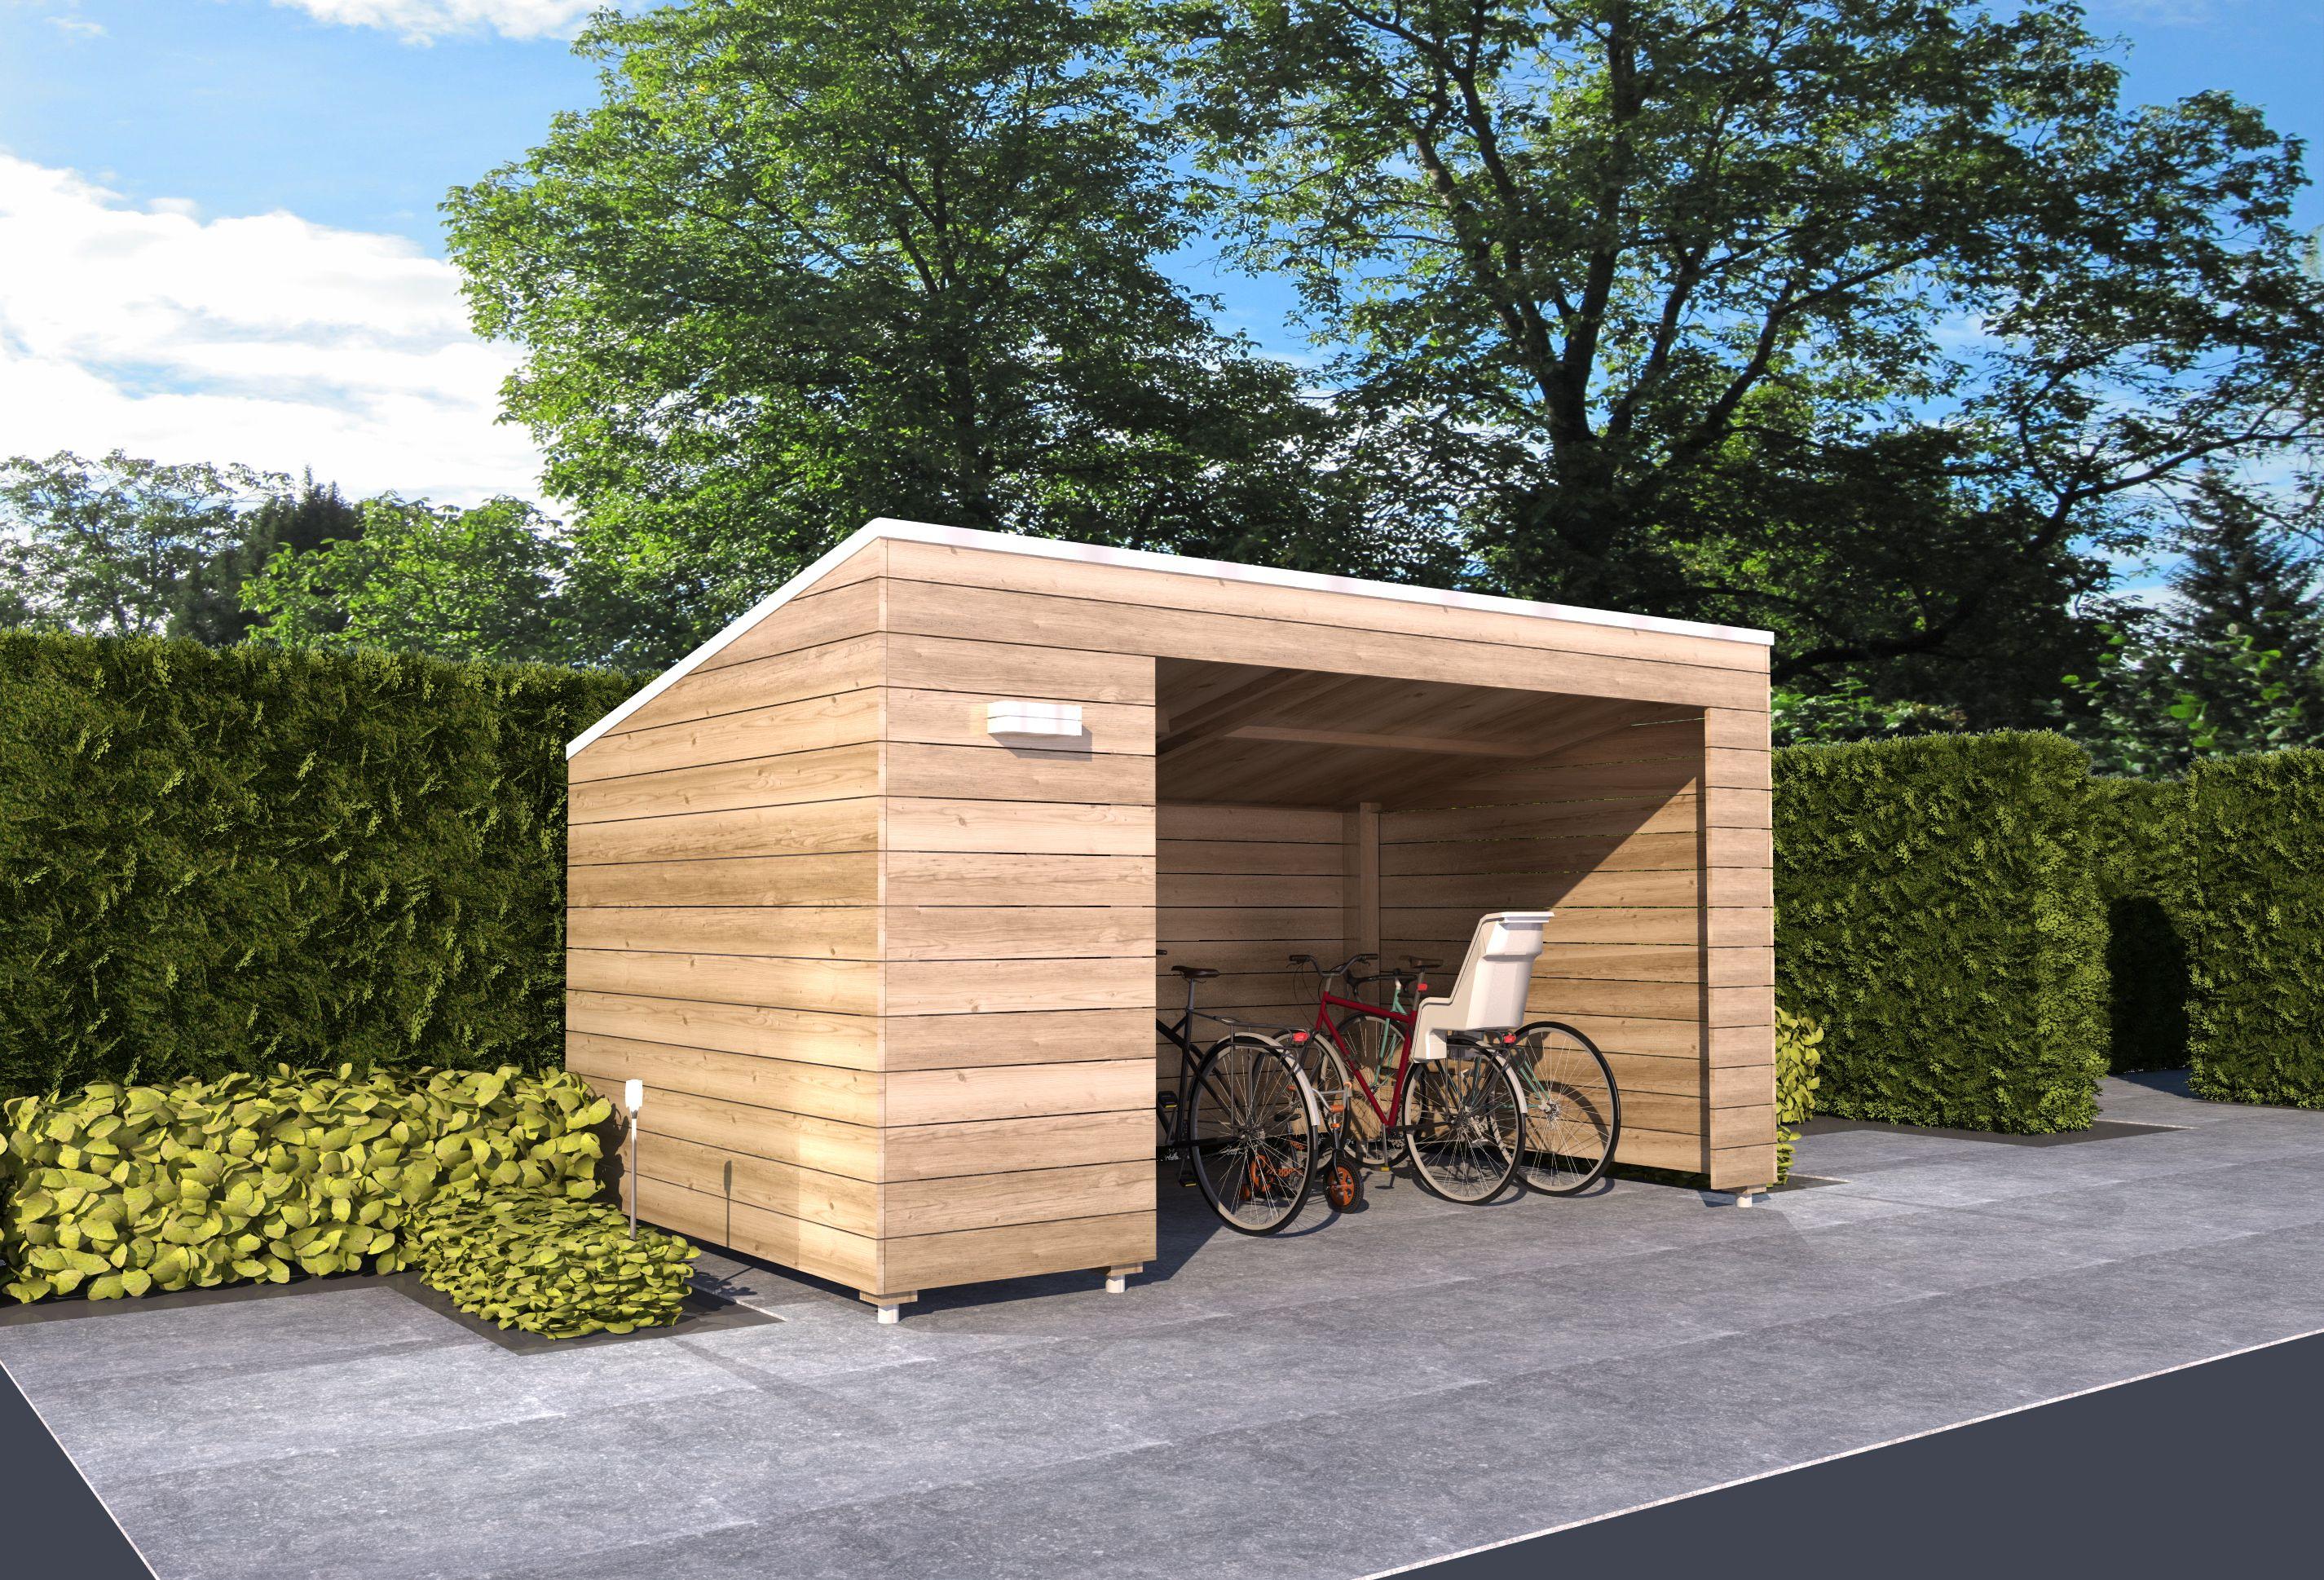 Ontwerp fietsenstalling tuin pinterest for Ontwerp tuin